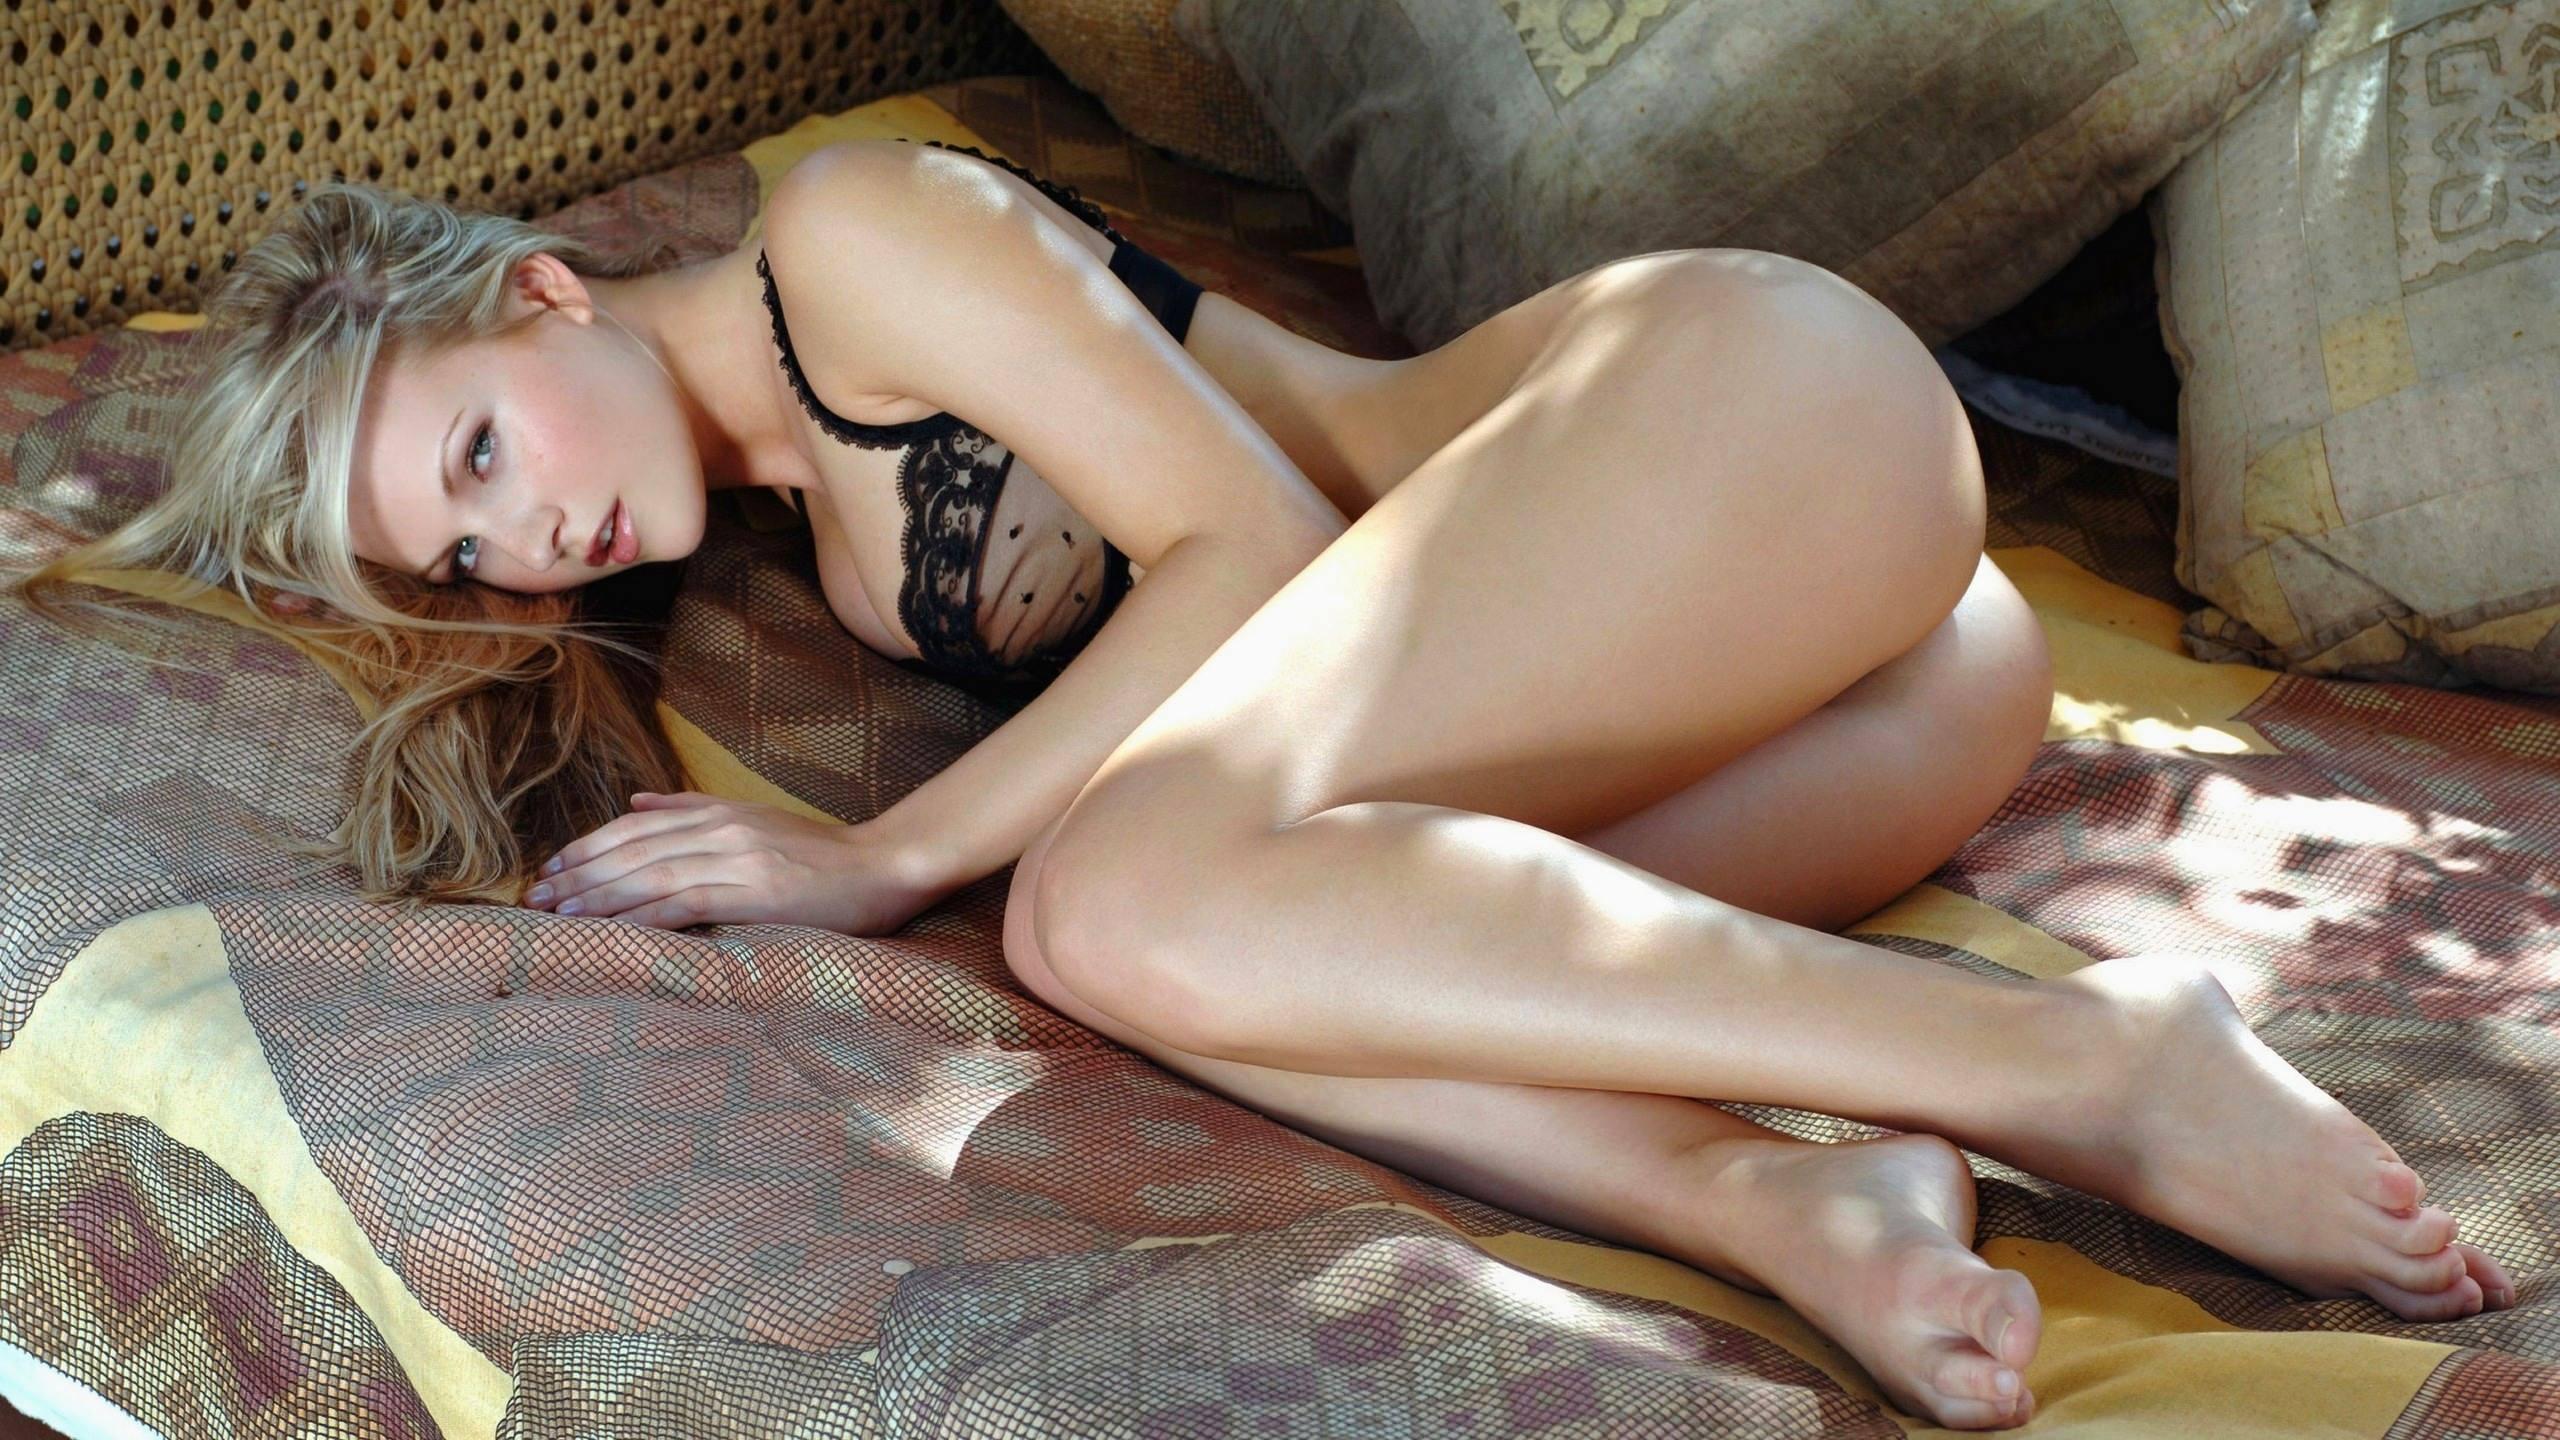 Naked Russian Girl Pics